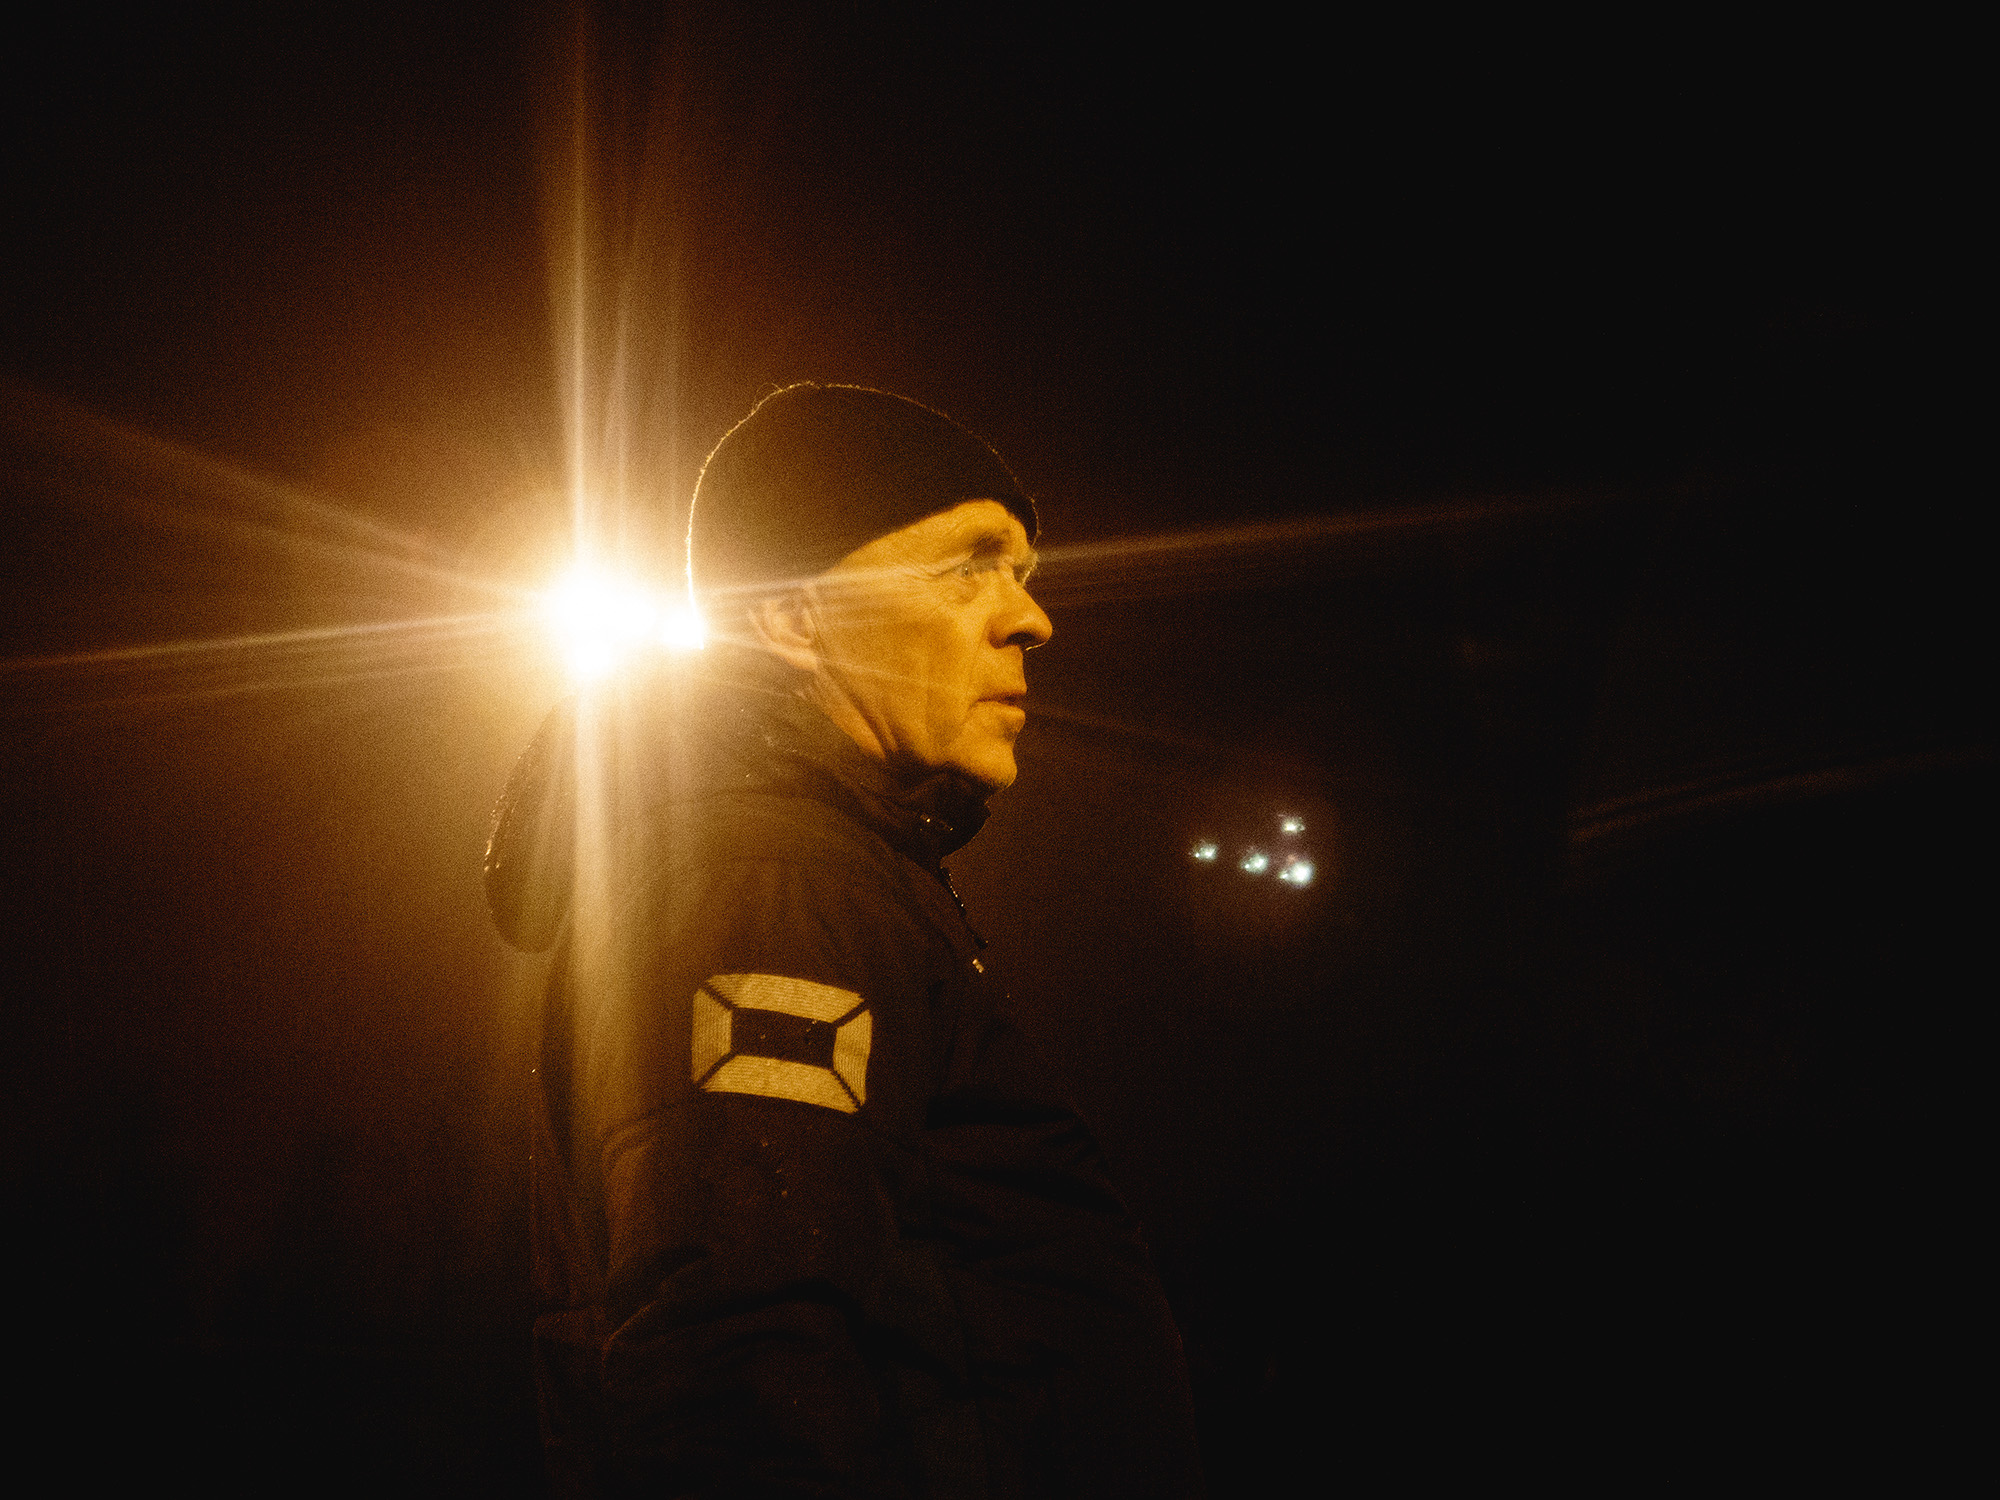 Miehen sivuprofiili, takana kirkas valo.